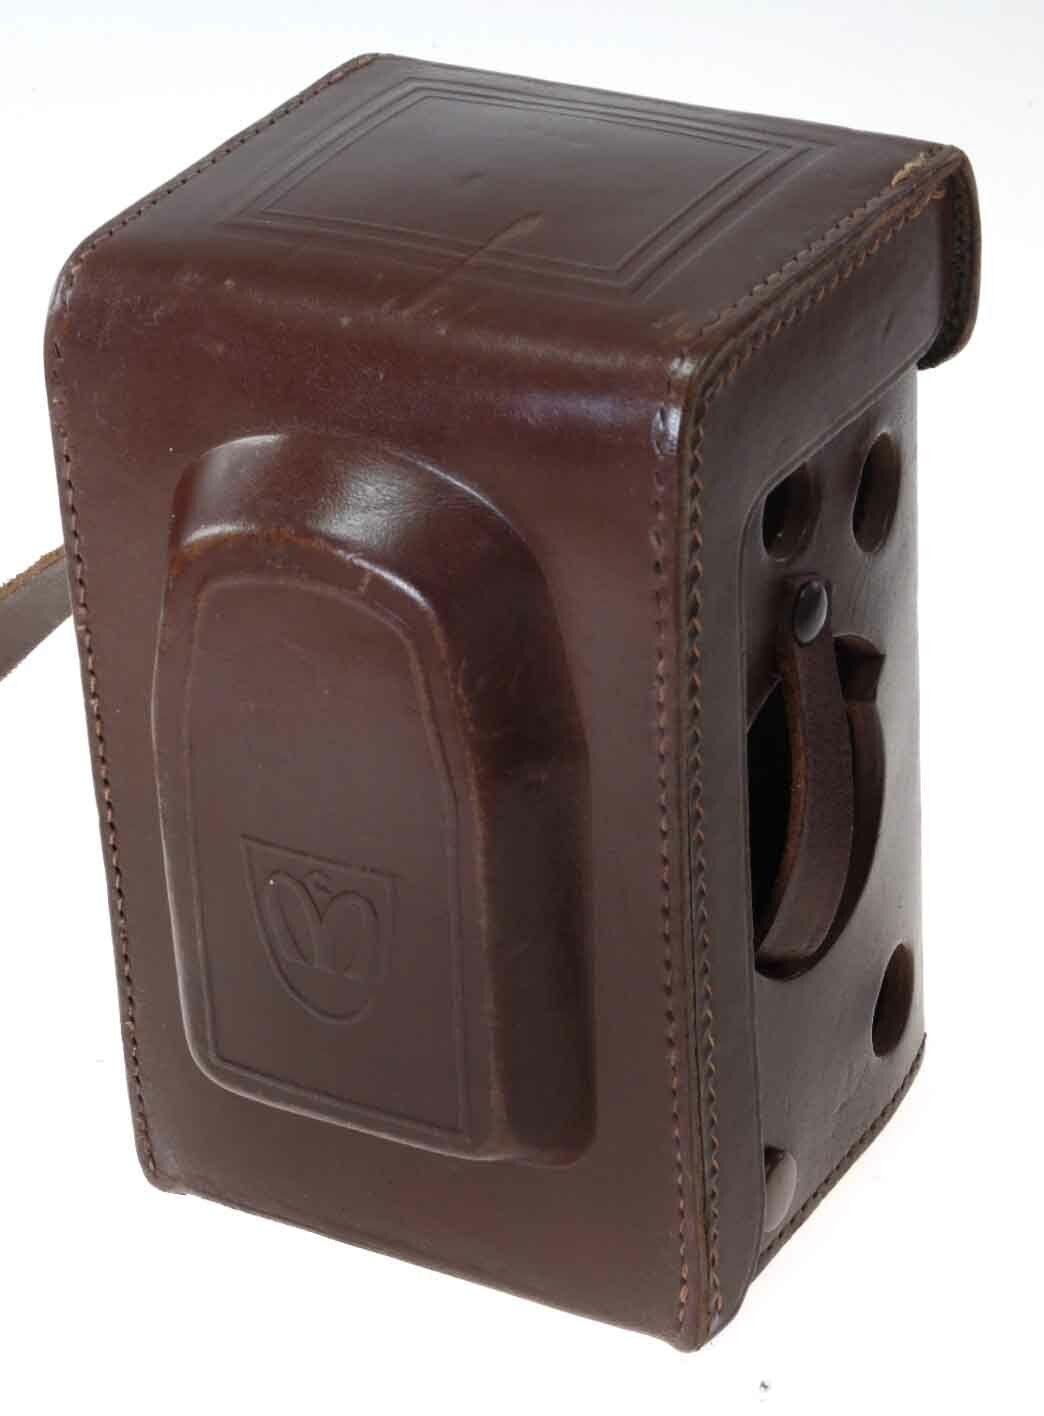 Montanus TLR Leather Case - For Delmonta Etc..